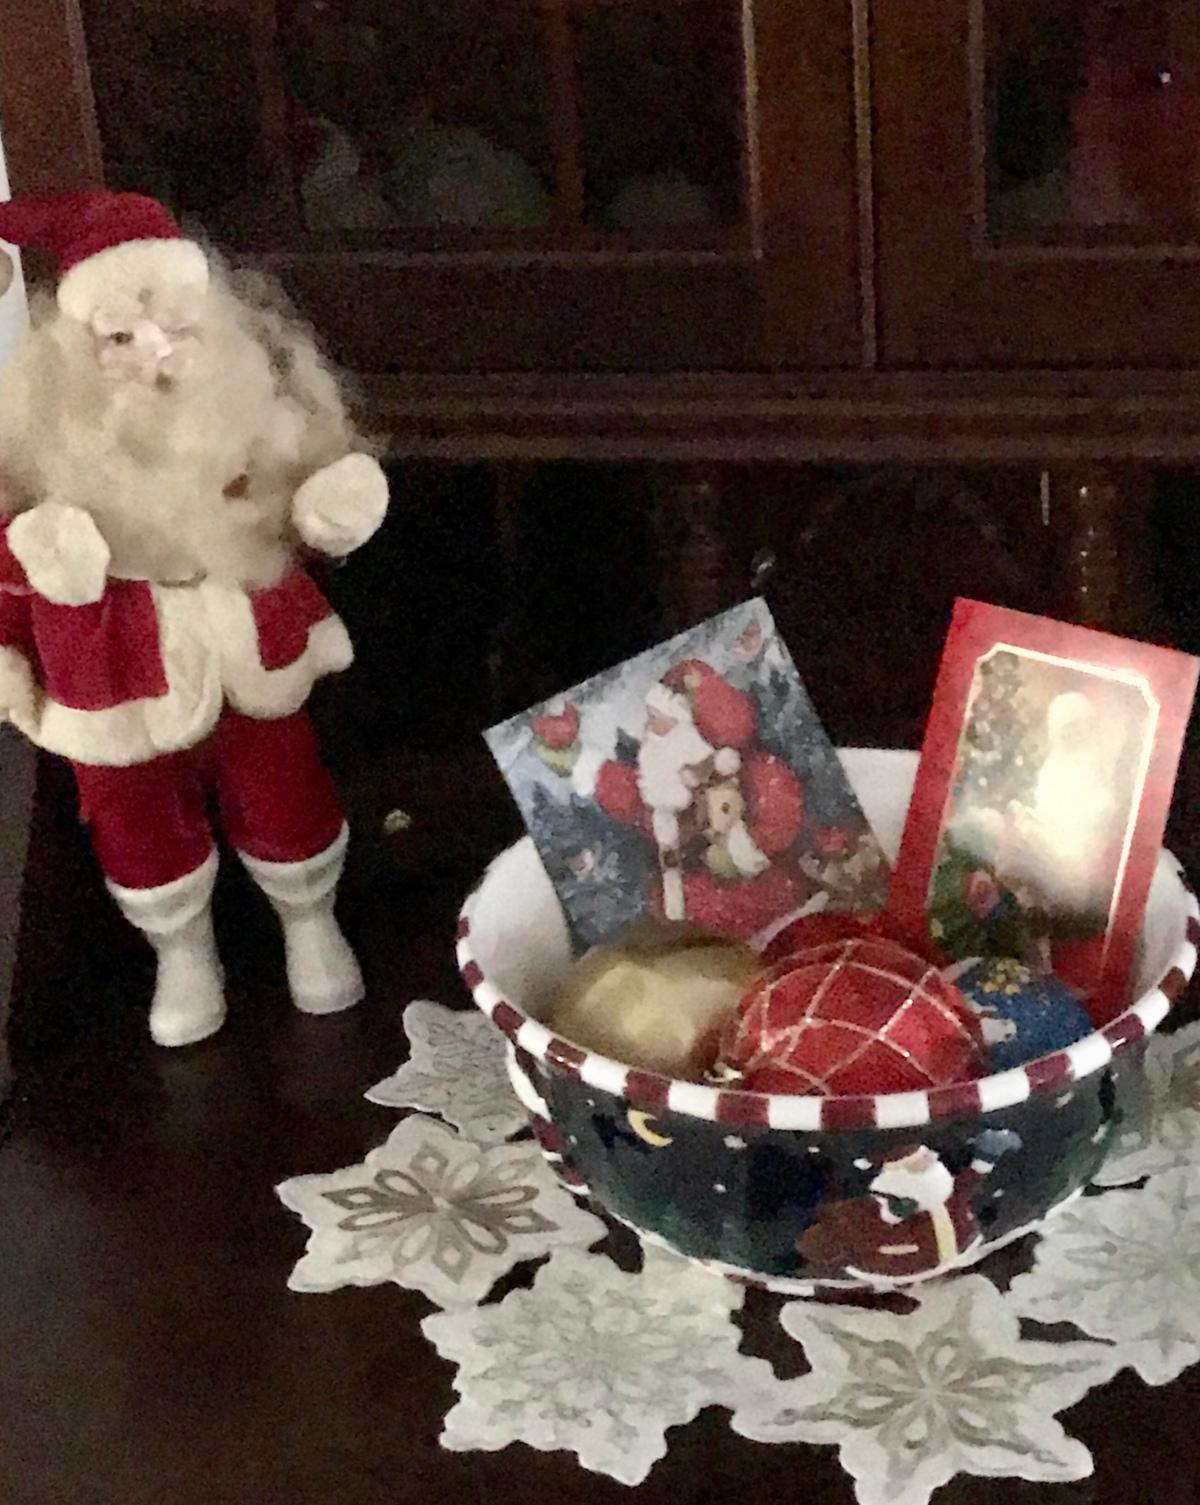 Christmas Decor at DorightManor